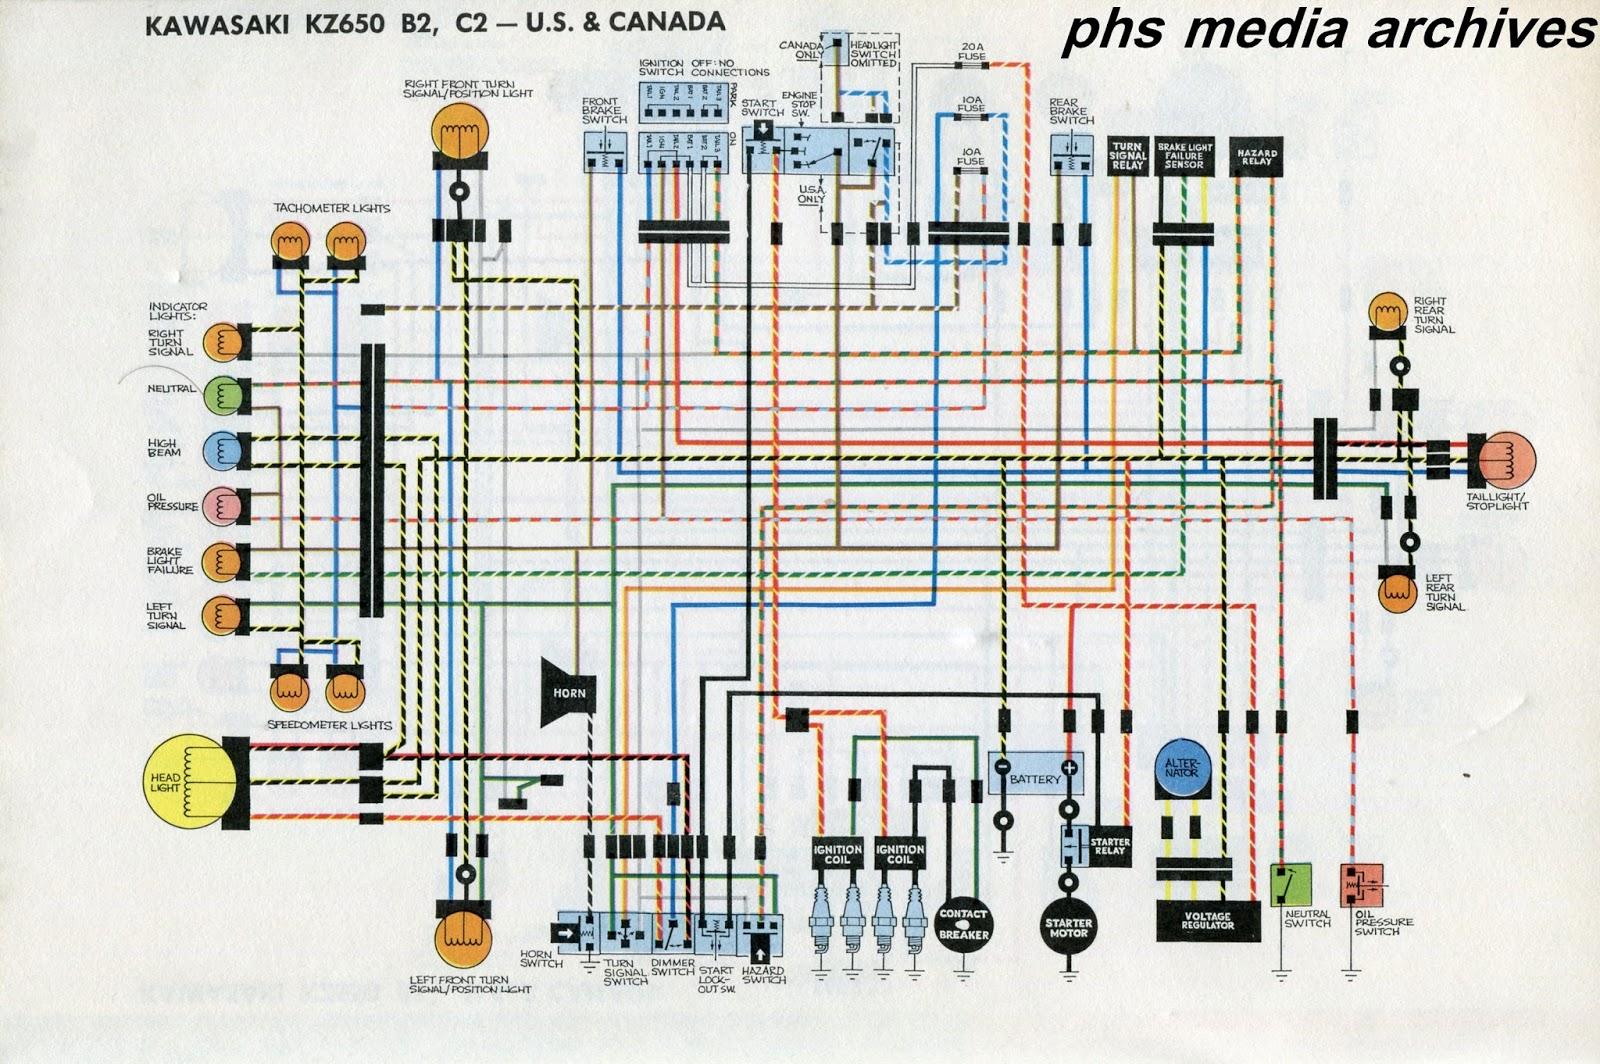 z650 wiring diagram jenn air refrigerator parts tech series kawasaki kz650 diagrams